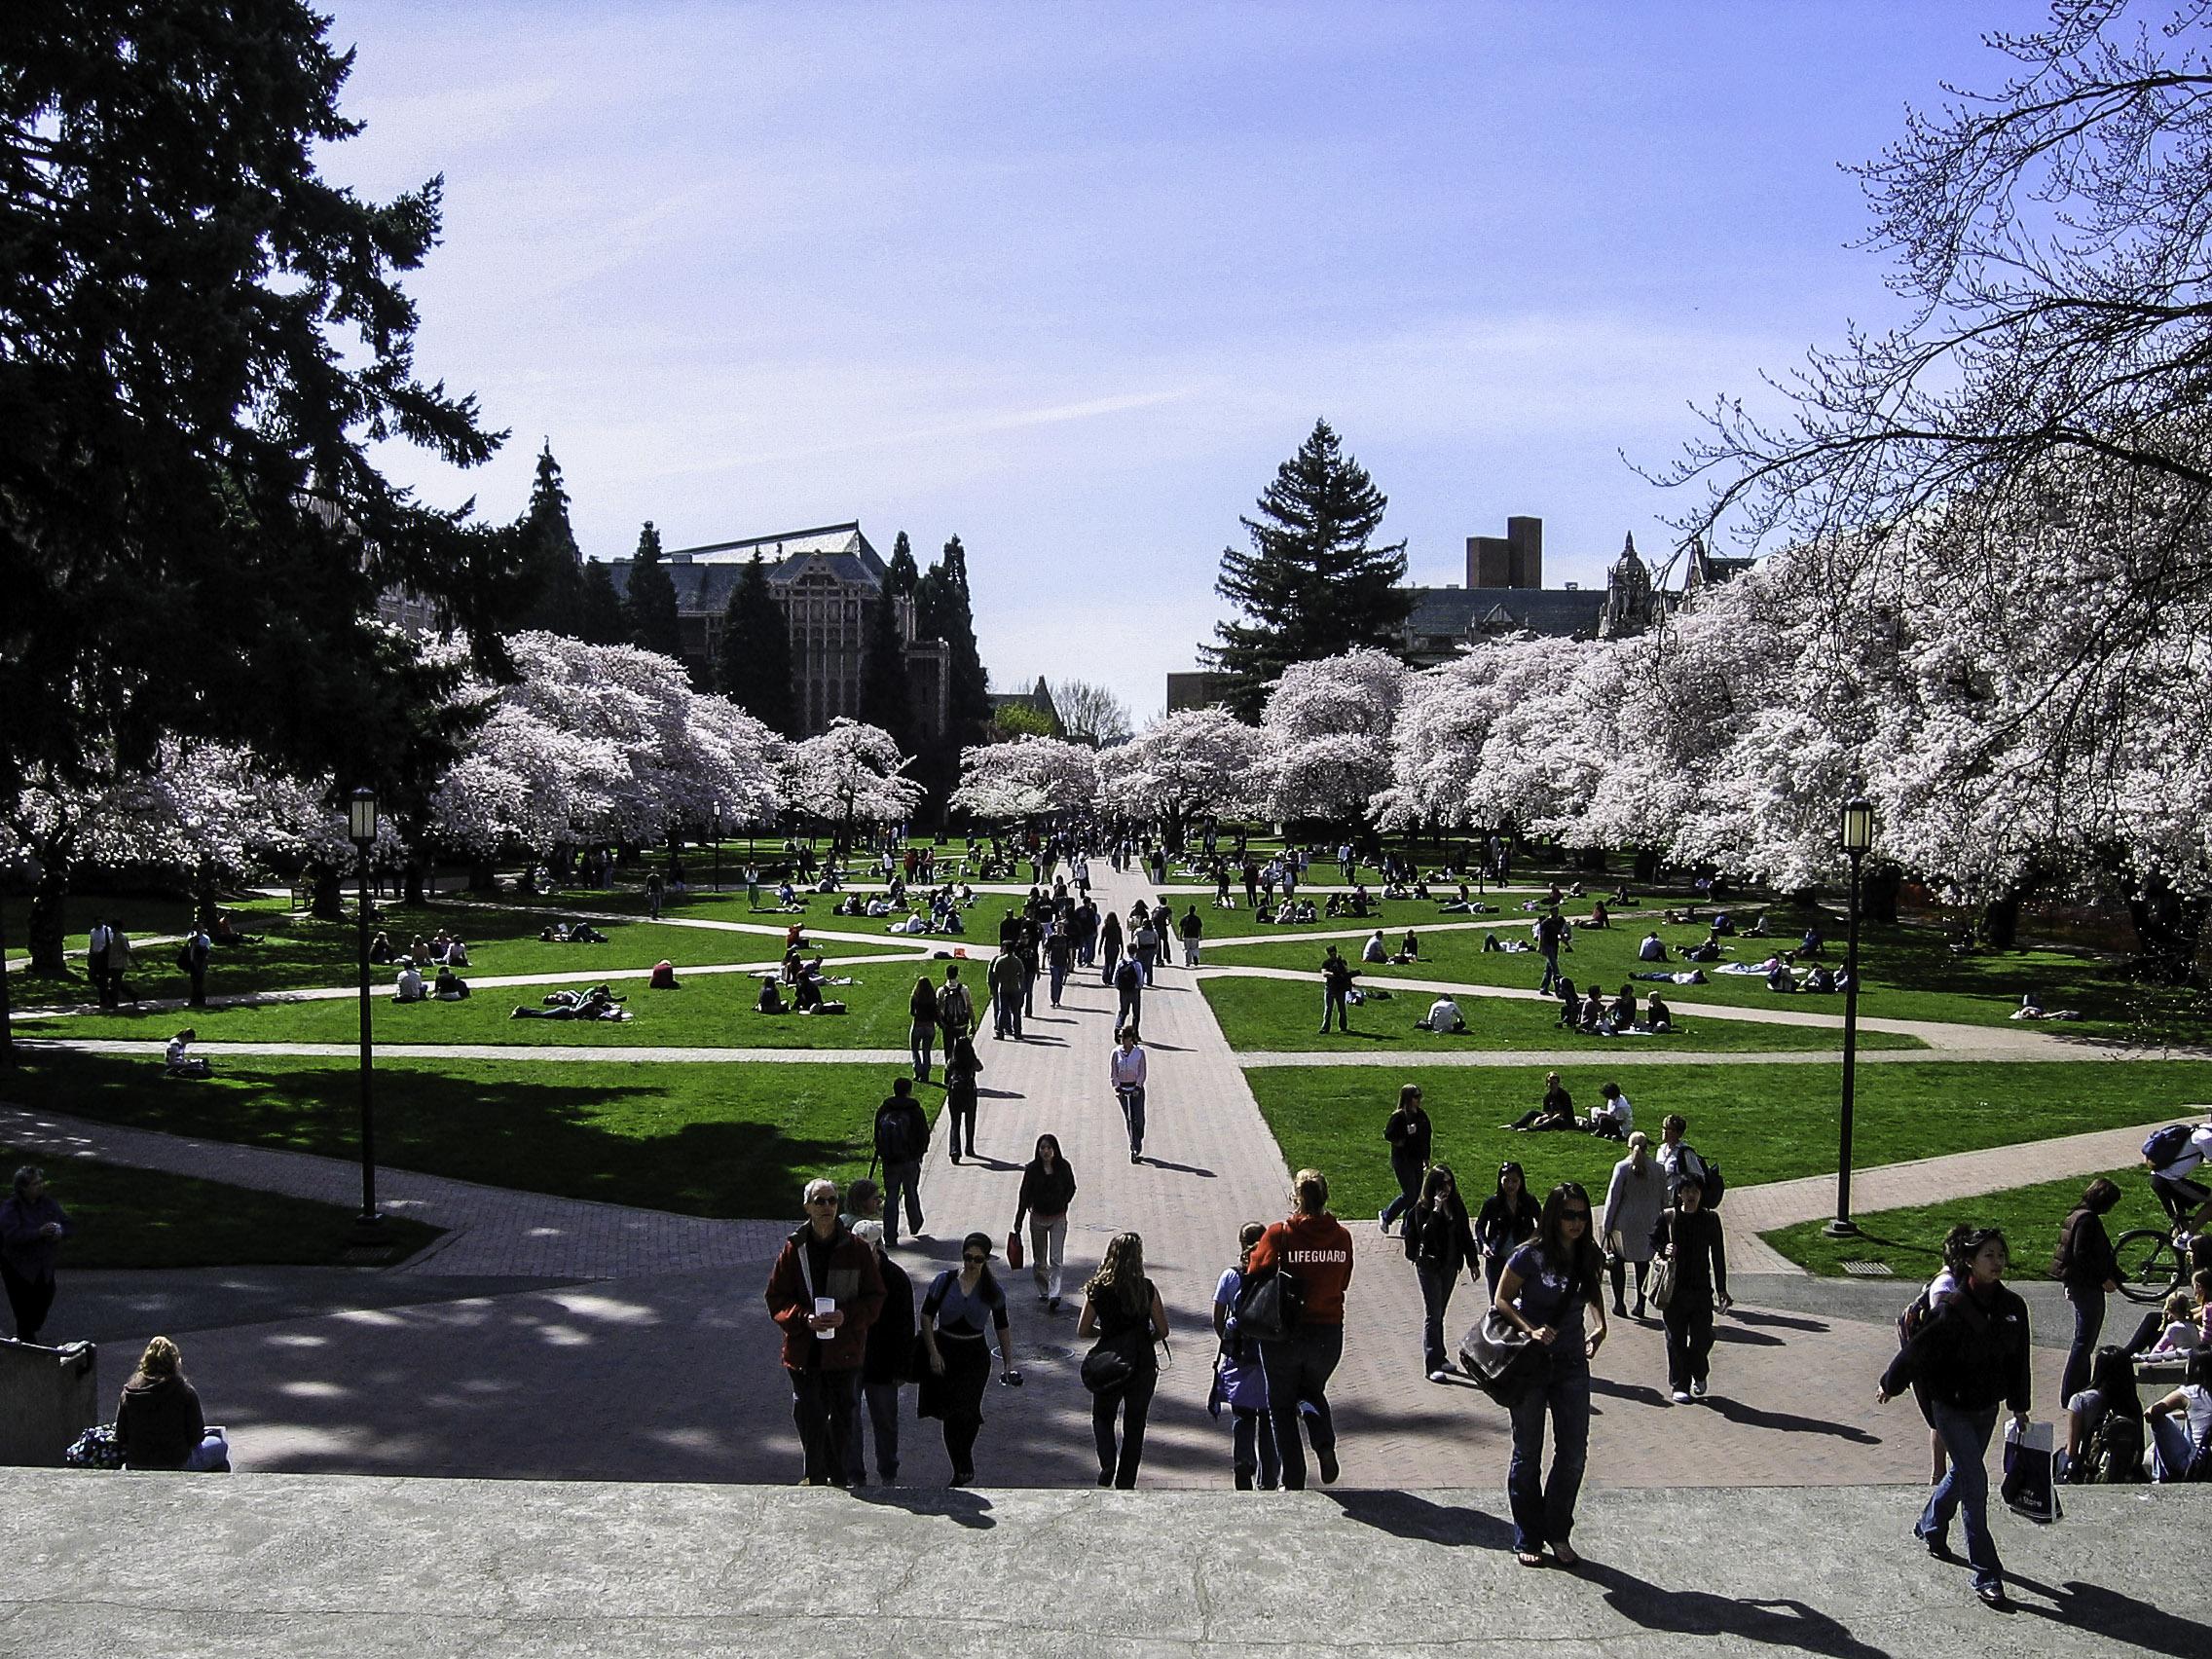 """University of Washington quad in spring in Seattle"" copyright CC0 from goodfreephotos.com"